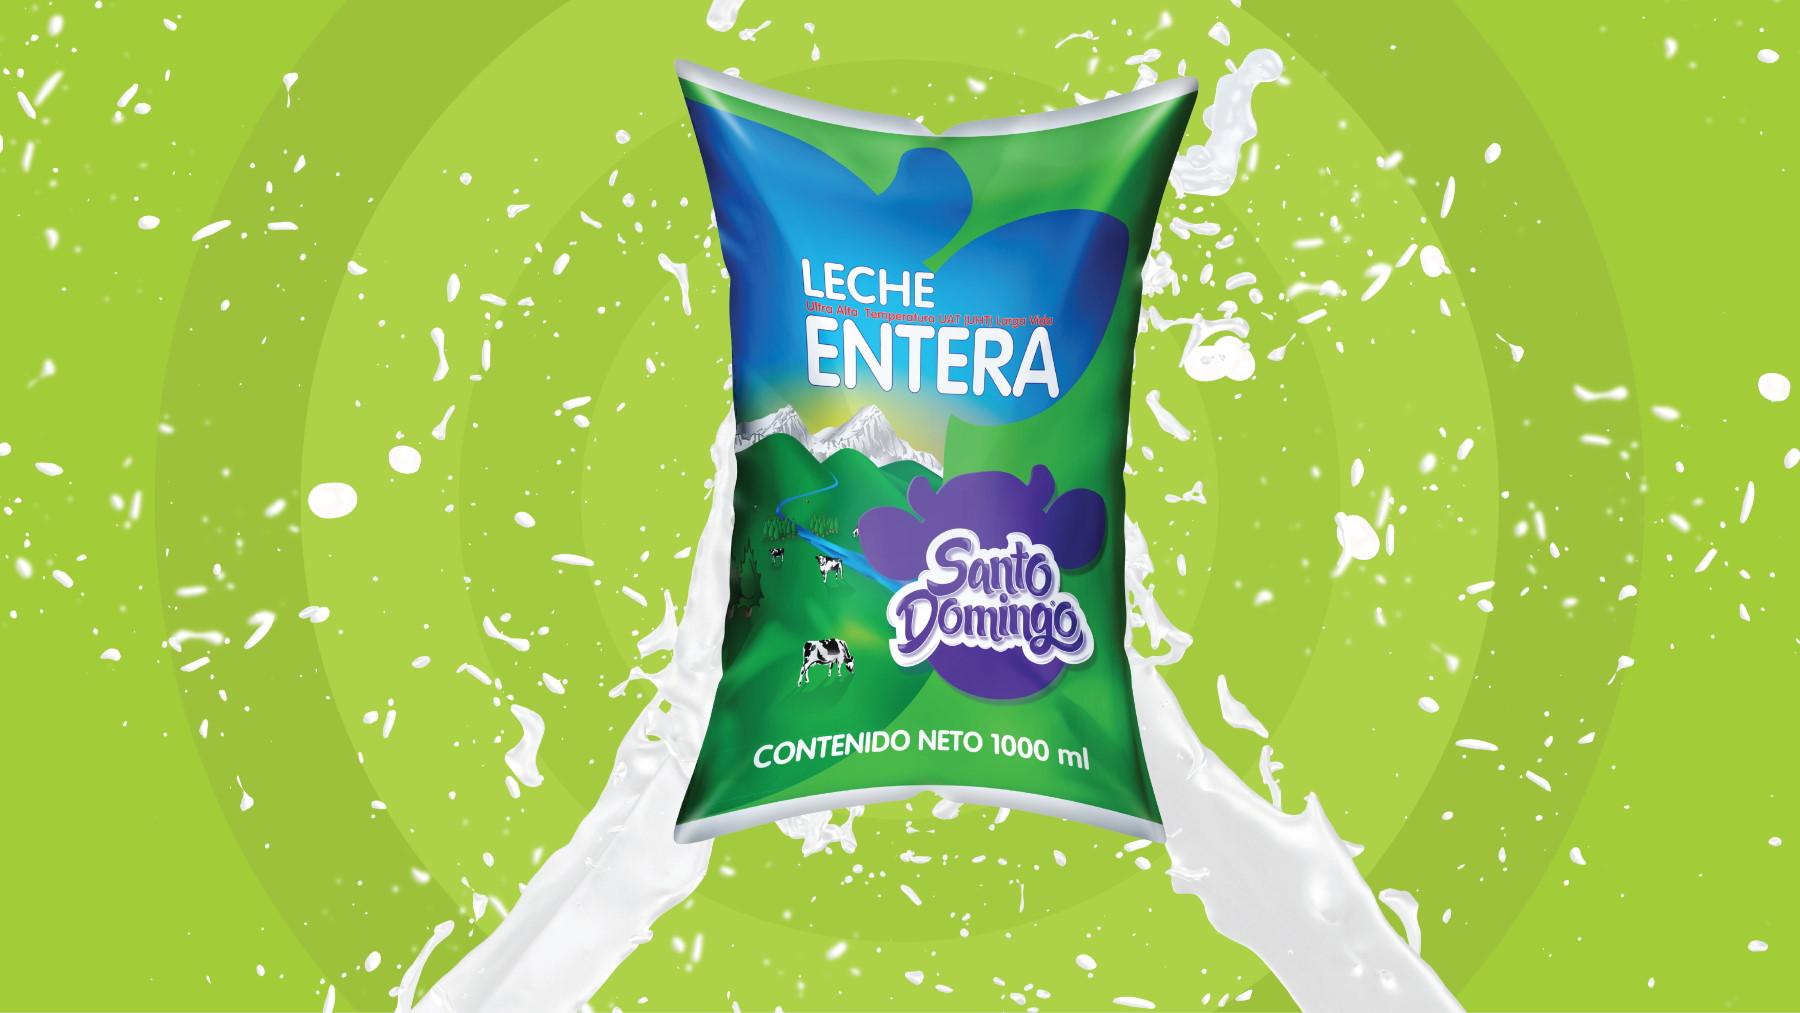 Leche Entera UHT Media Vida